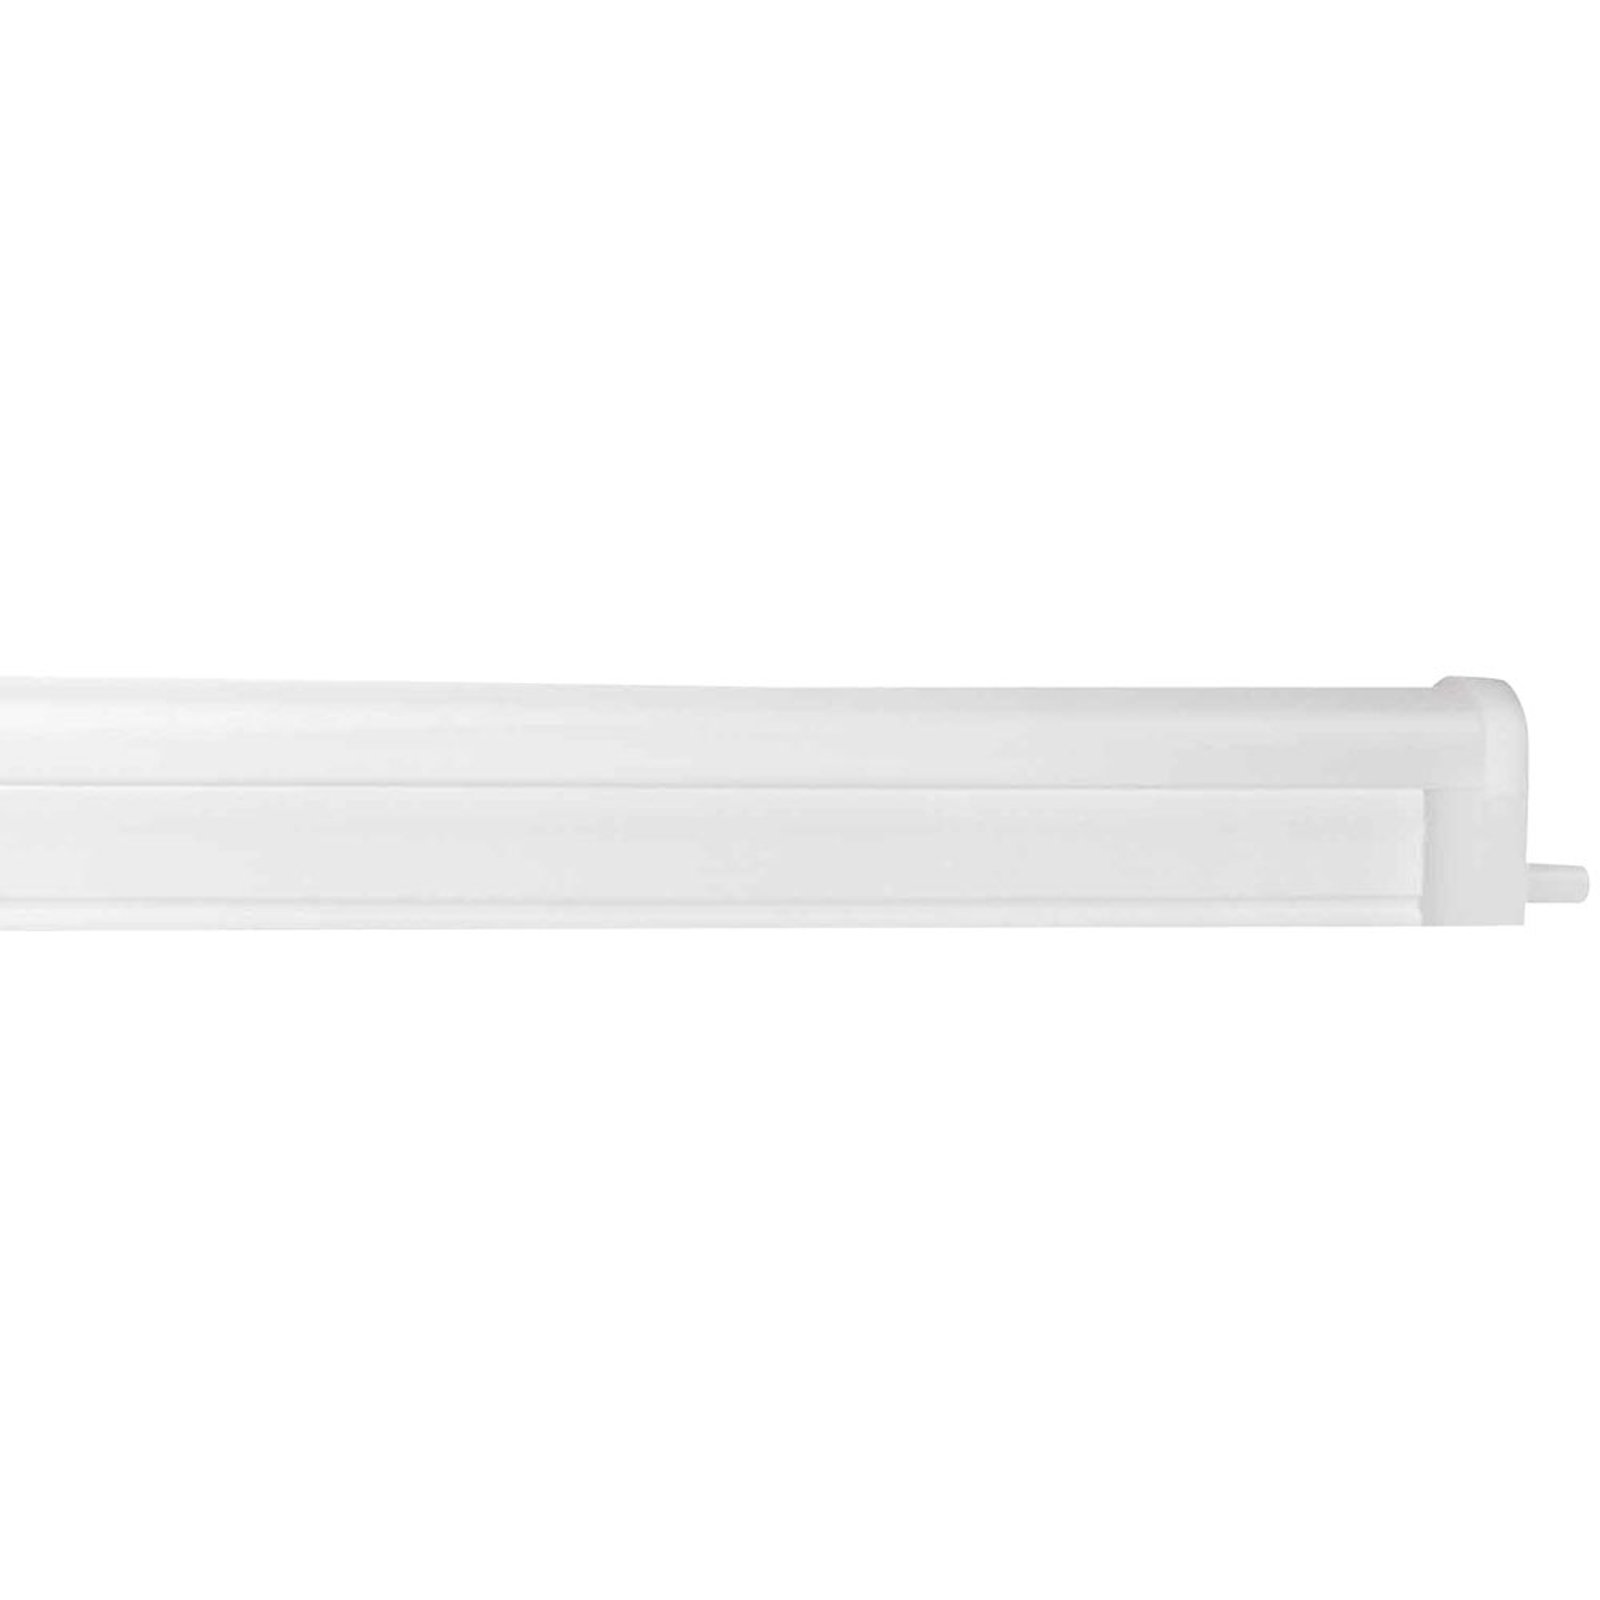 Megaman Pinolite LED-plantelampe, 58 cm, 8,5 W